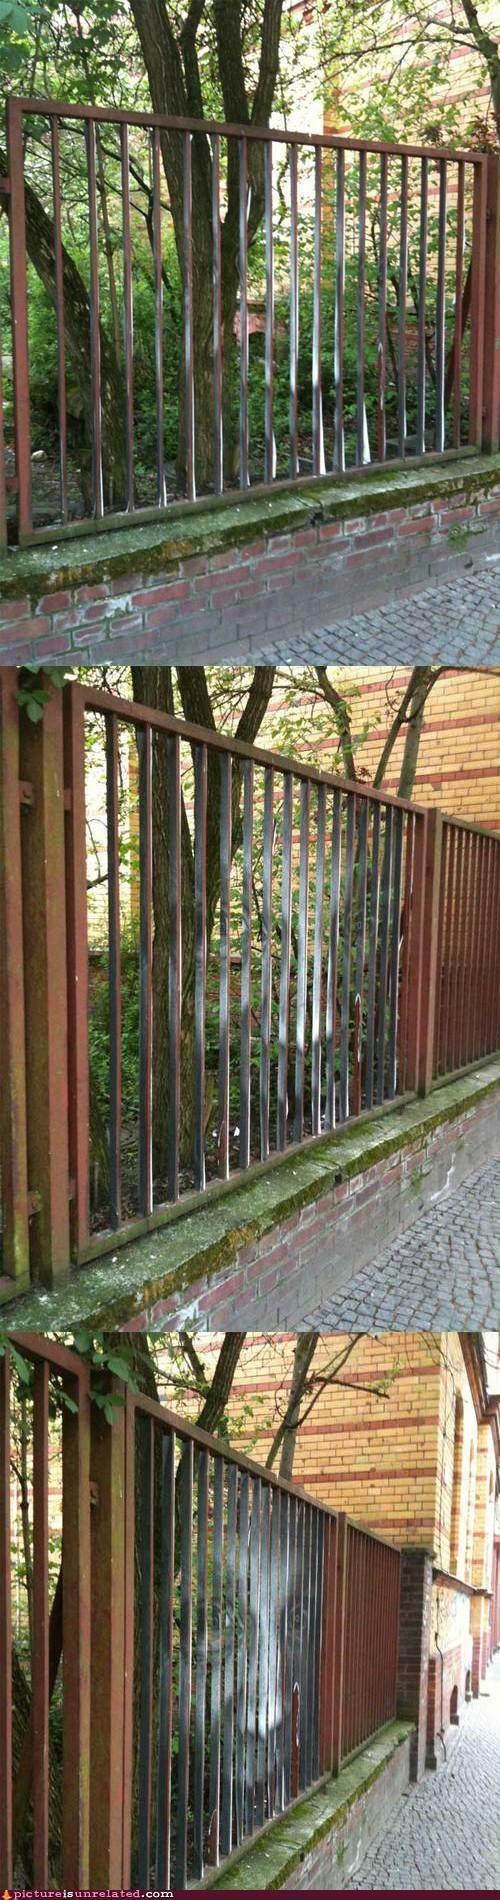 art face fence paint wtf - 4988450304